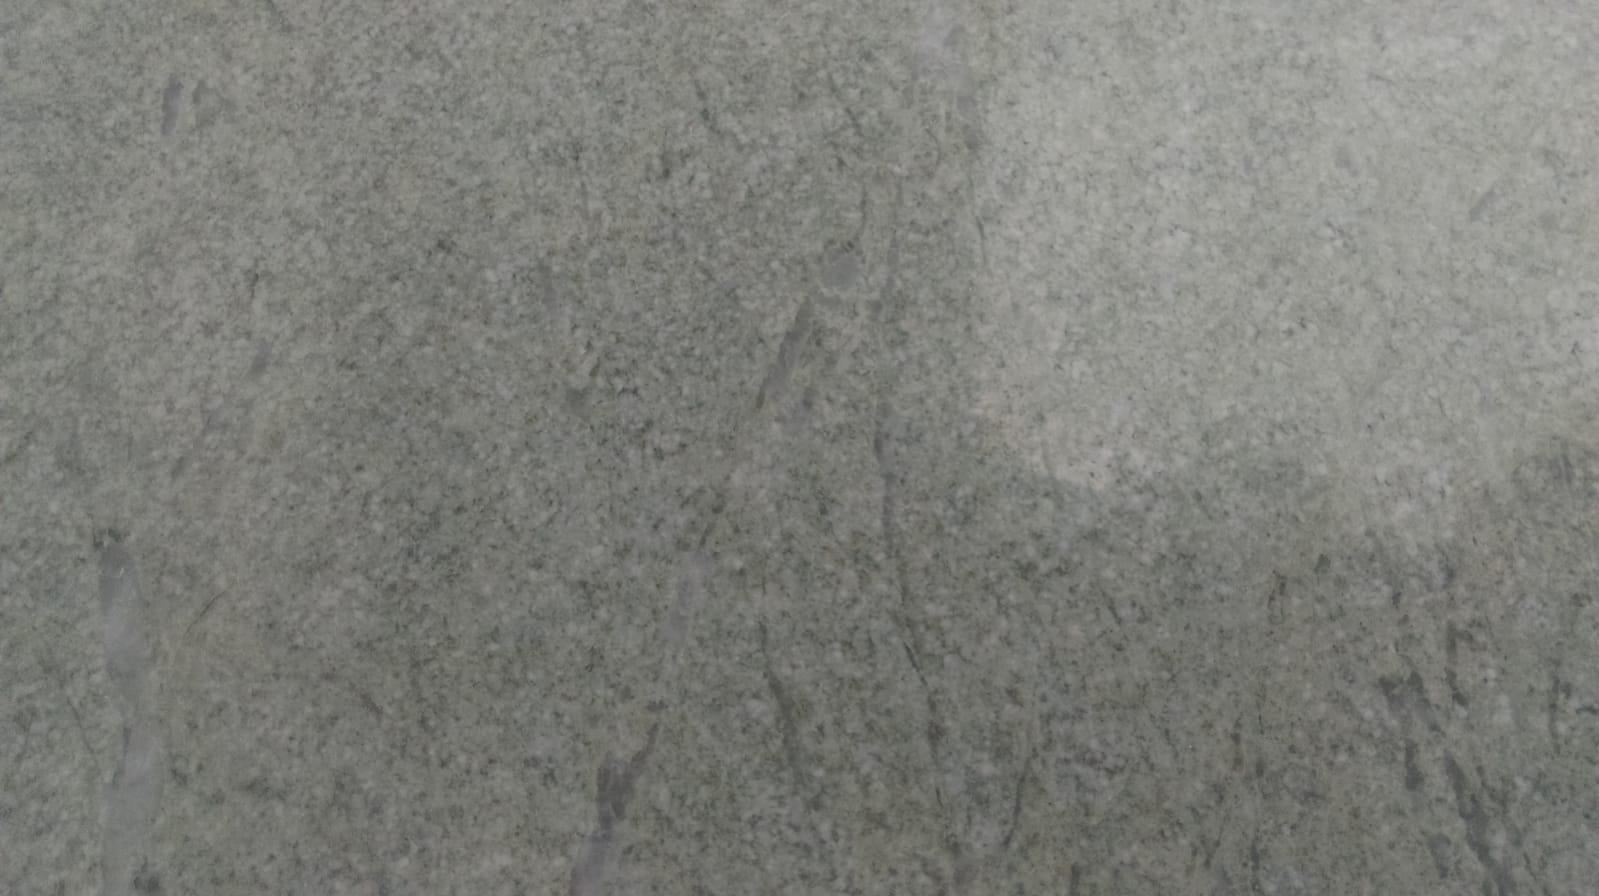 Hell Green Granite Natural stone